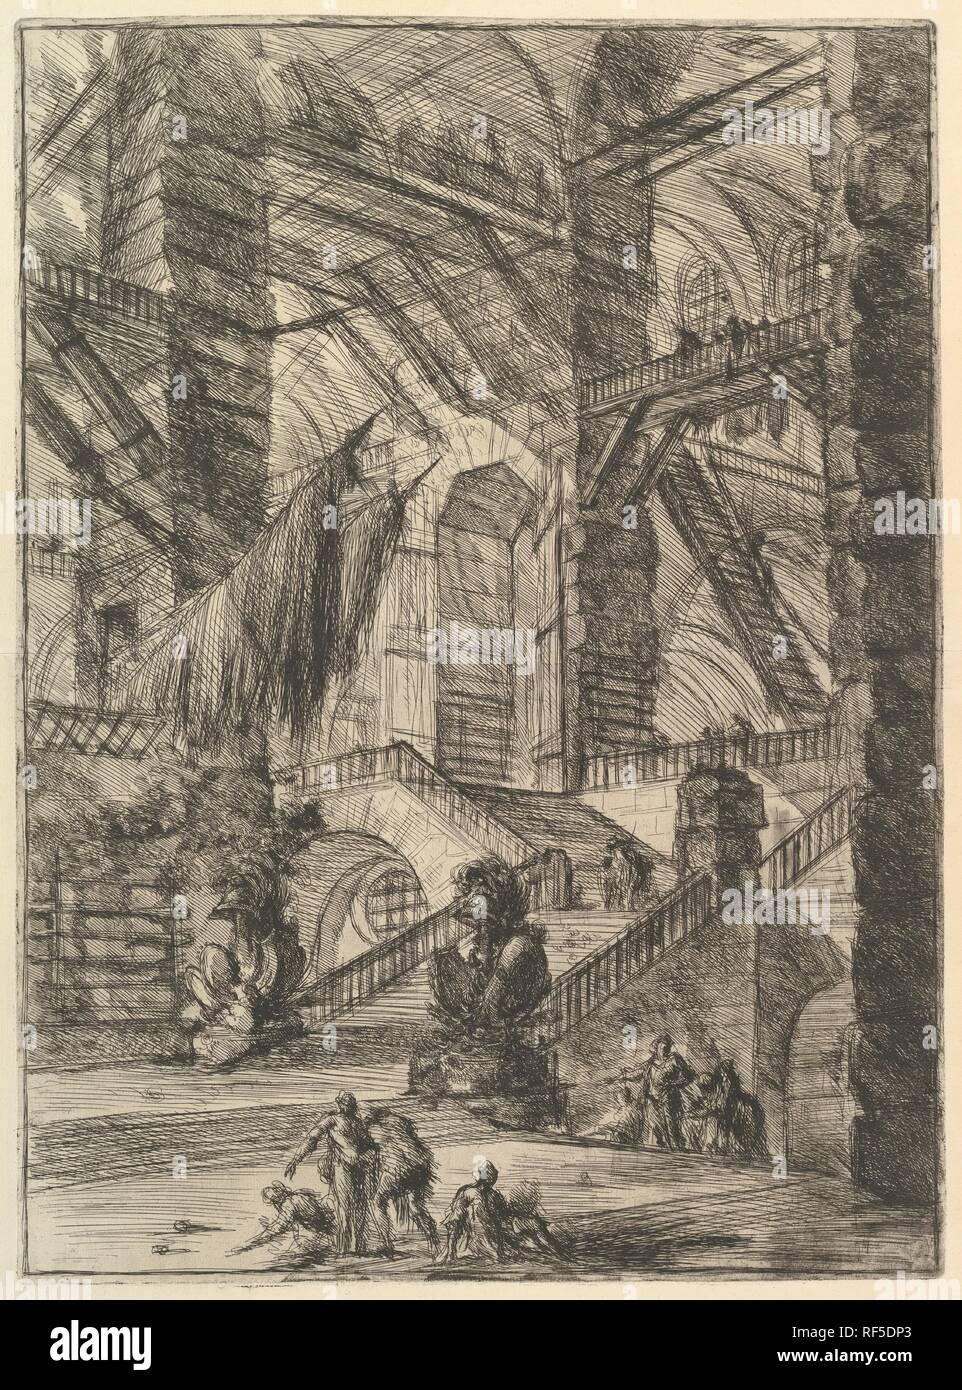 La escalera con trofeos, de Carceri d'invenzione imaginario (cárceles). Artista: Giovanni Battista Piranesi (Italiano, Mogliano Veneto Roma 1720-1778). Dimensiones: Hoja: 25 x 19 1/2 pulg. (63,5 x 49,5 cm) Placa: 21 1/2 x 15 3/4 pulg. (54,6 x 40 cm). Editor: Giovanni Bouchard (Francés, ca. 1716-1795). Series/Cartera: Carceri d'invenzione. Fecha: ca. 1749-50. Museo: Museo Metropolitano de Arte, Nueva York, Estados Unidos. Foto de stock